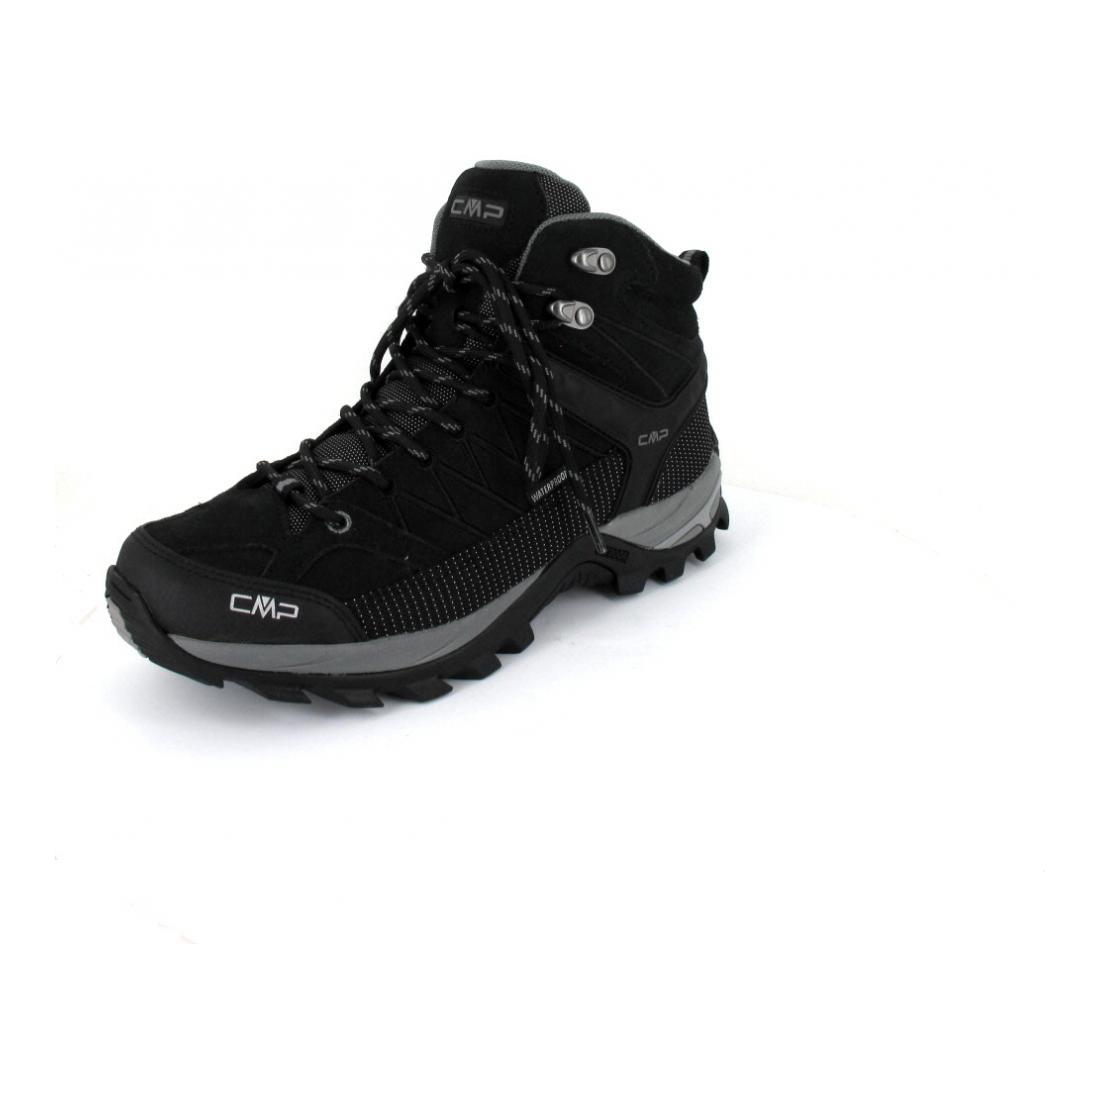 CMP Outdoor Stiefel Rigel Trekking Shoes WP